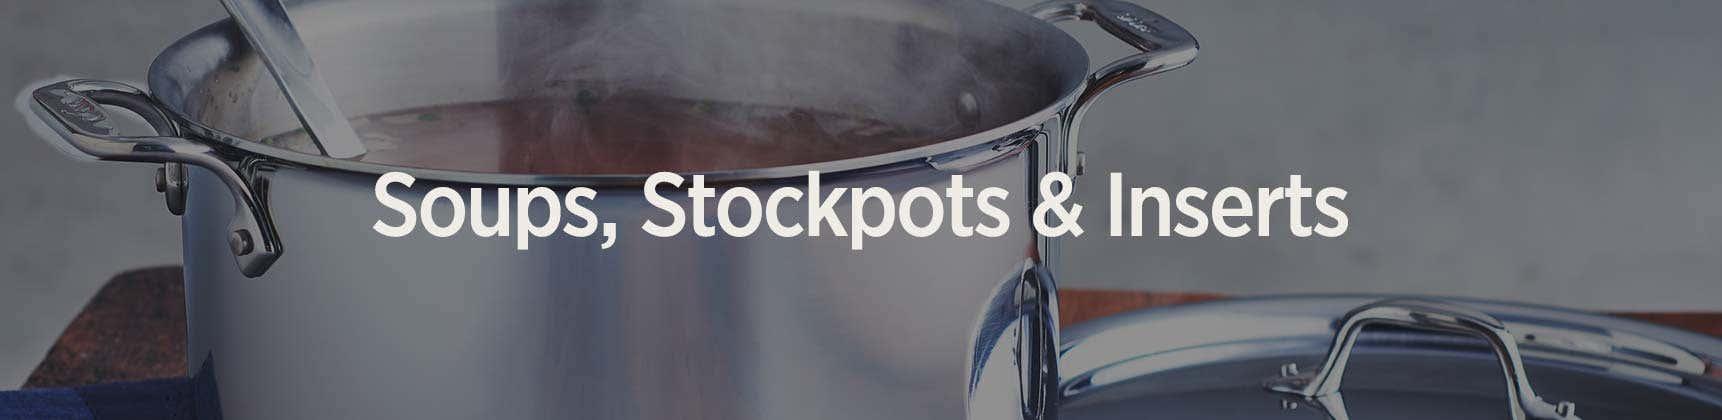 Soups & Stockpots